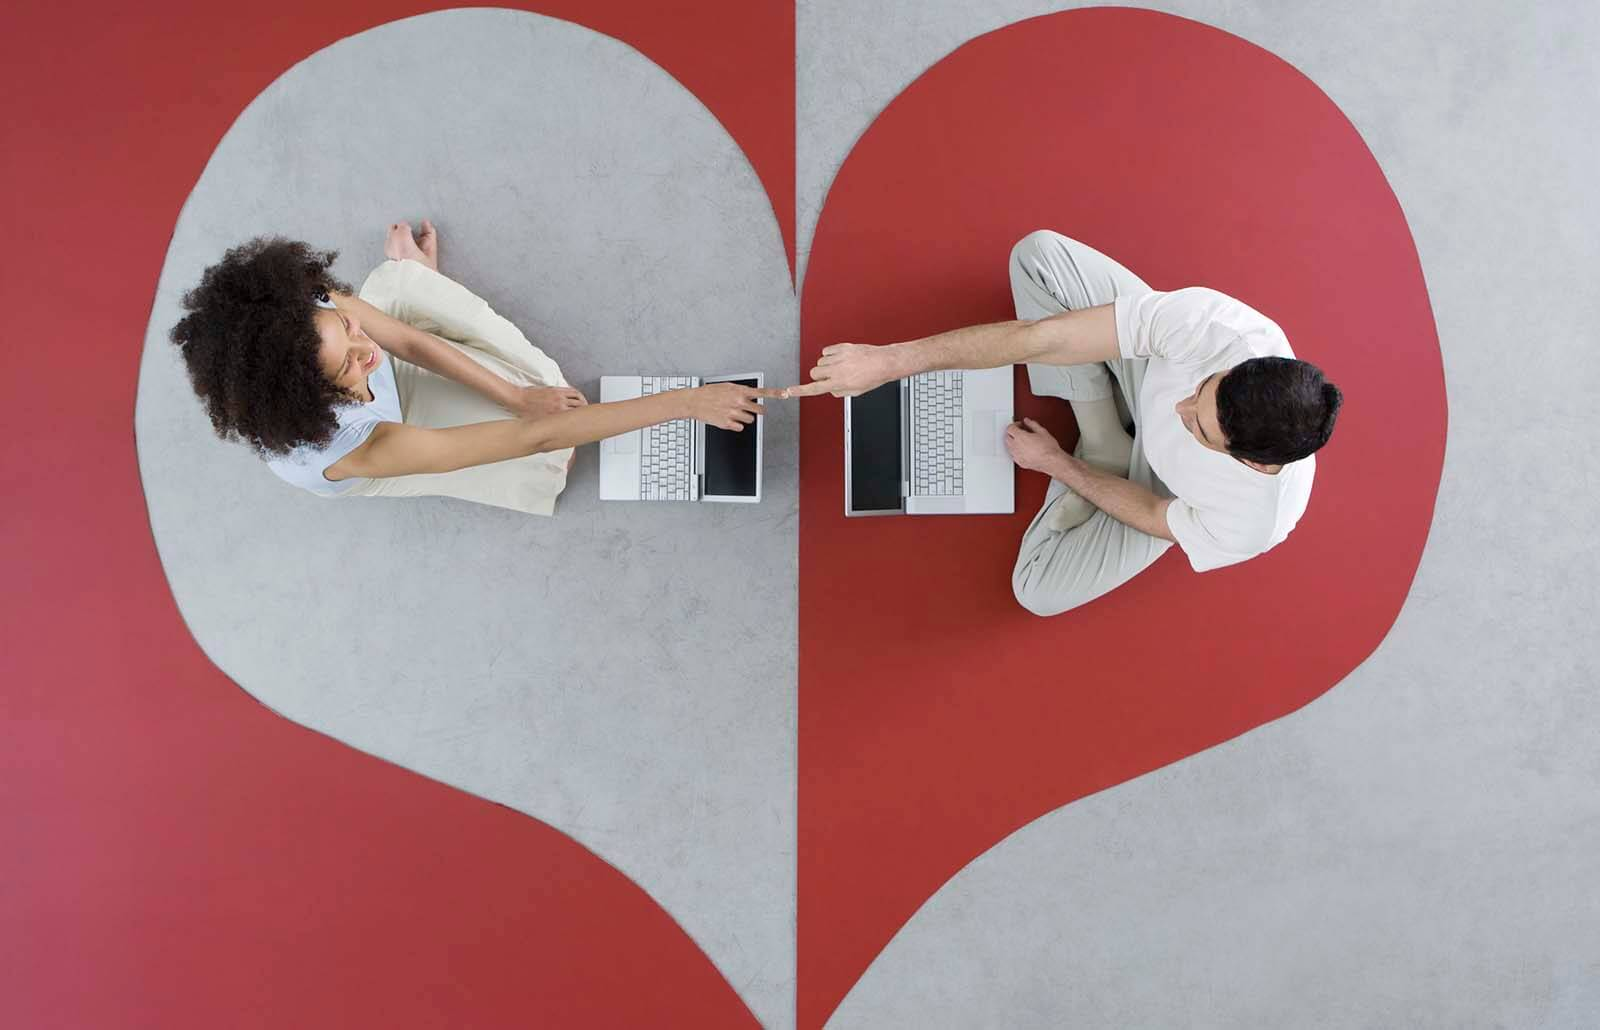 31 Fun Virtual Date Ideas | LoveToKnow